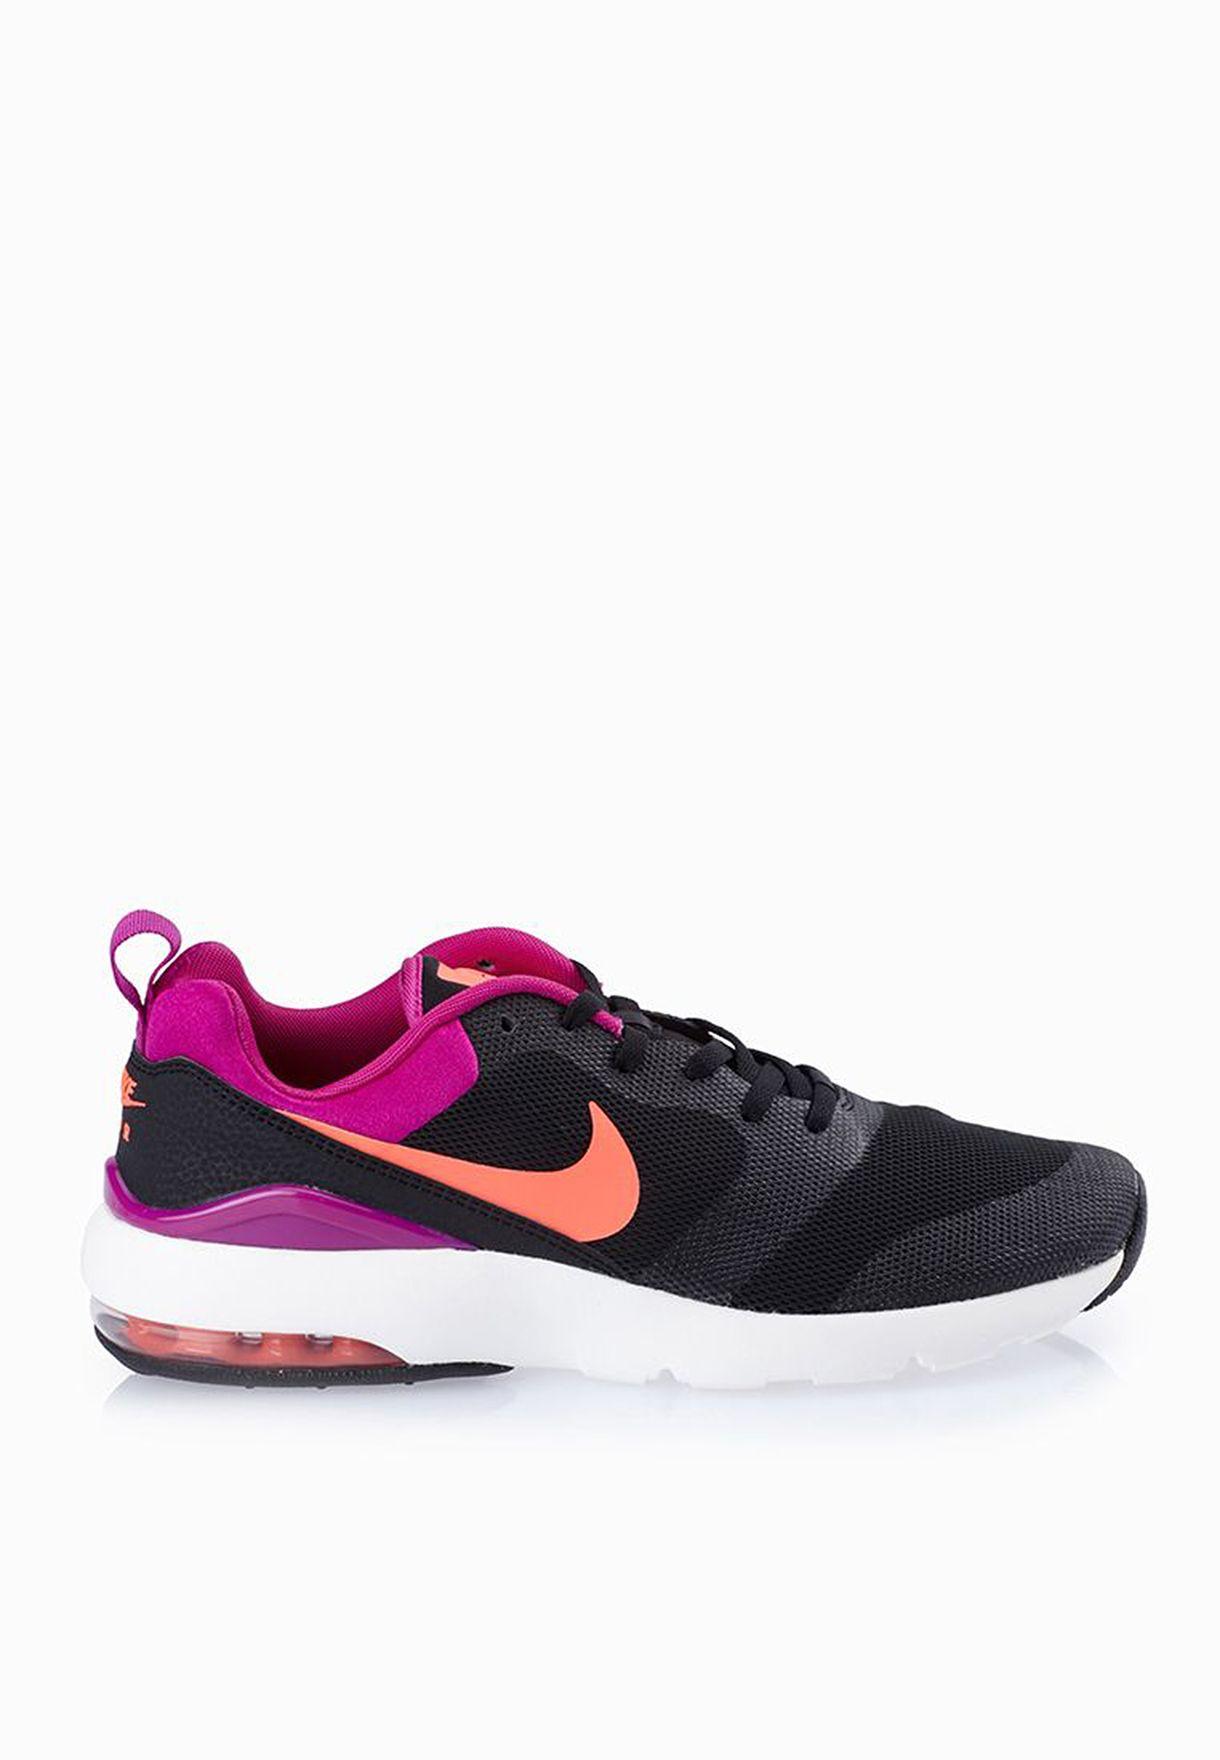 watch 34f41 480f3 Air Max Siren Sneakers